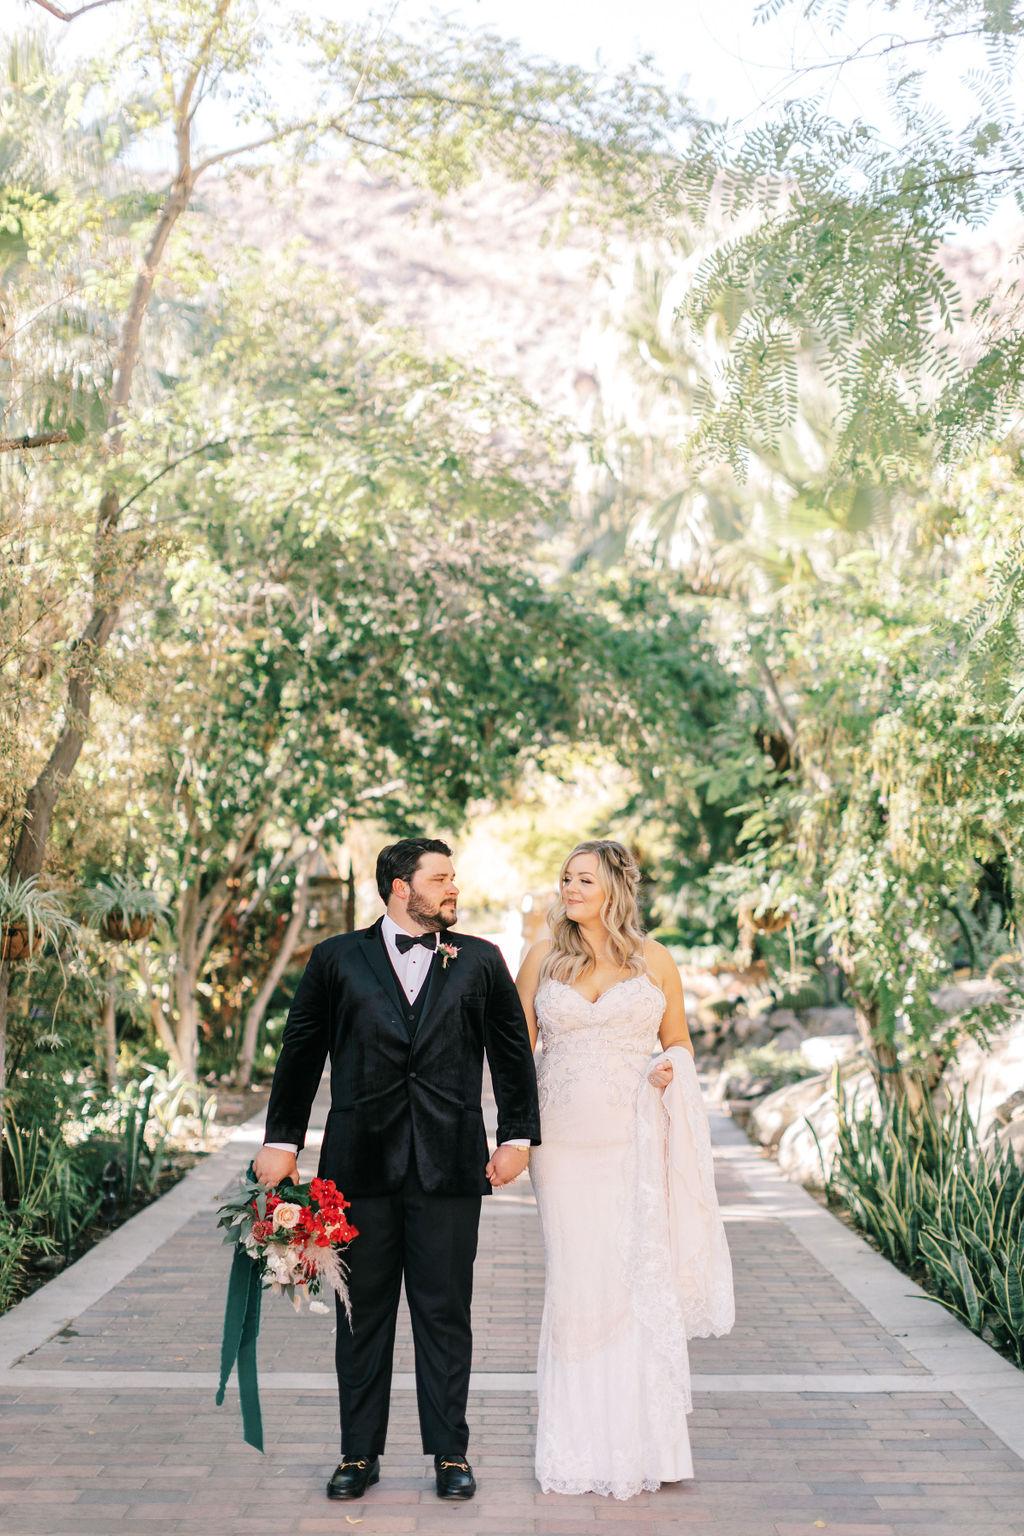 meagan robert wedding couple holding hands in courtyard